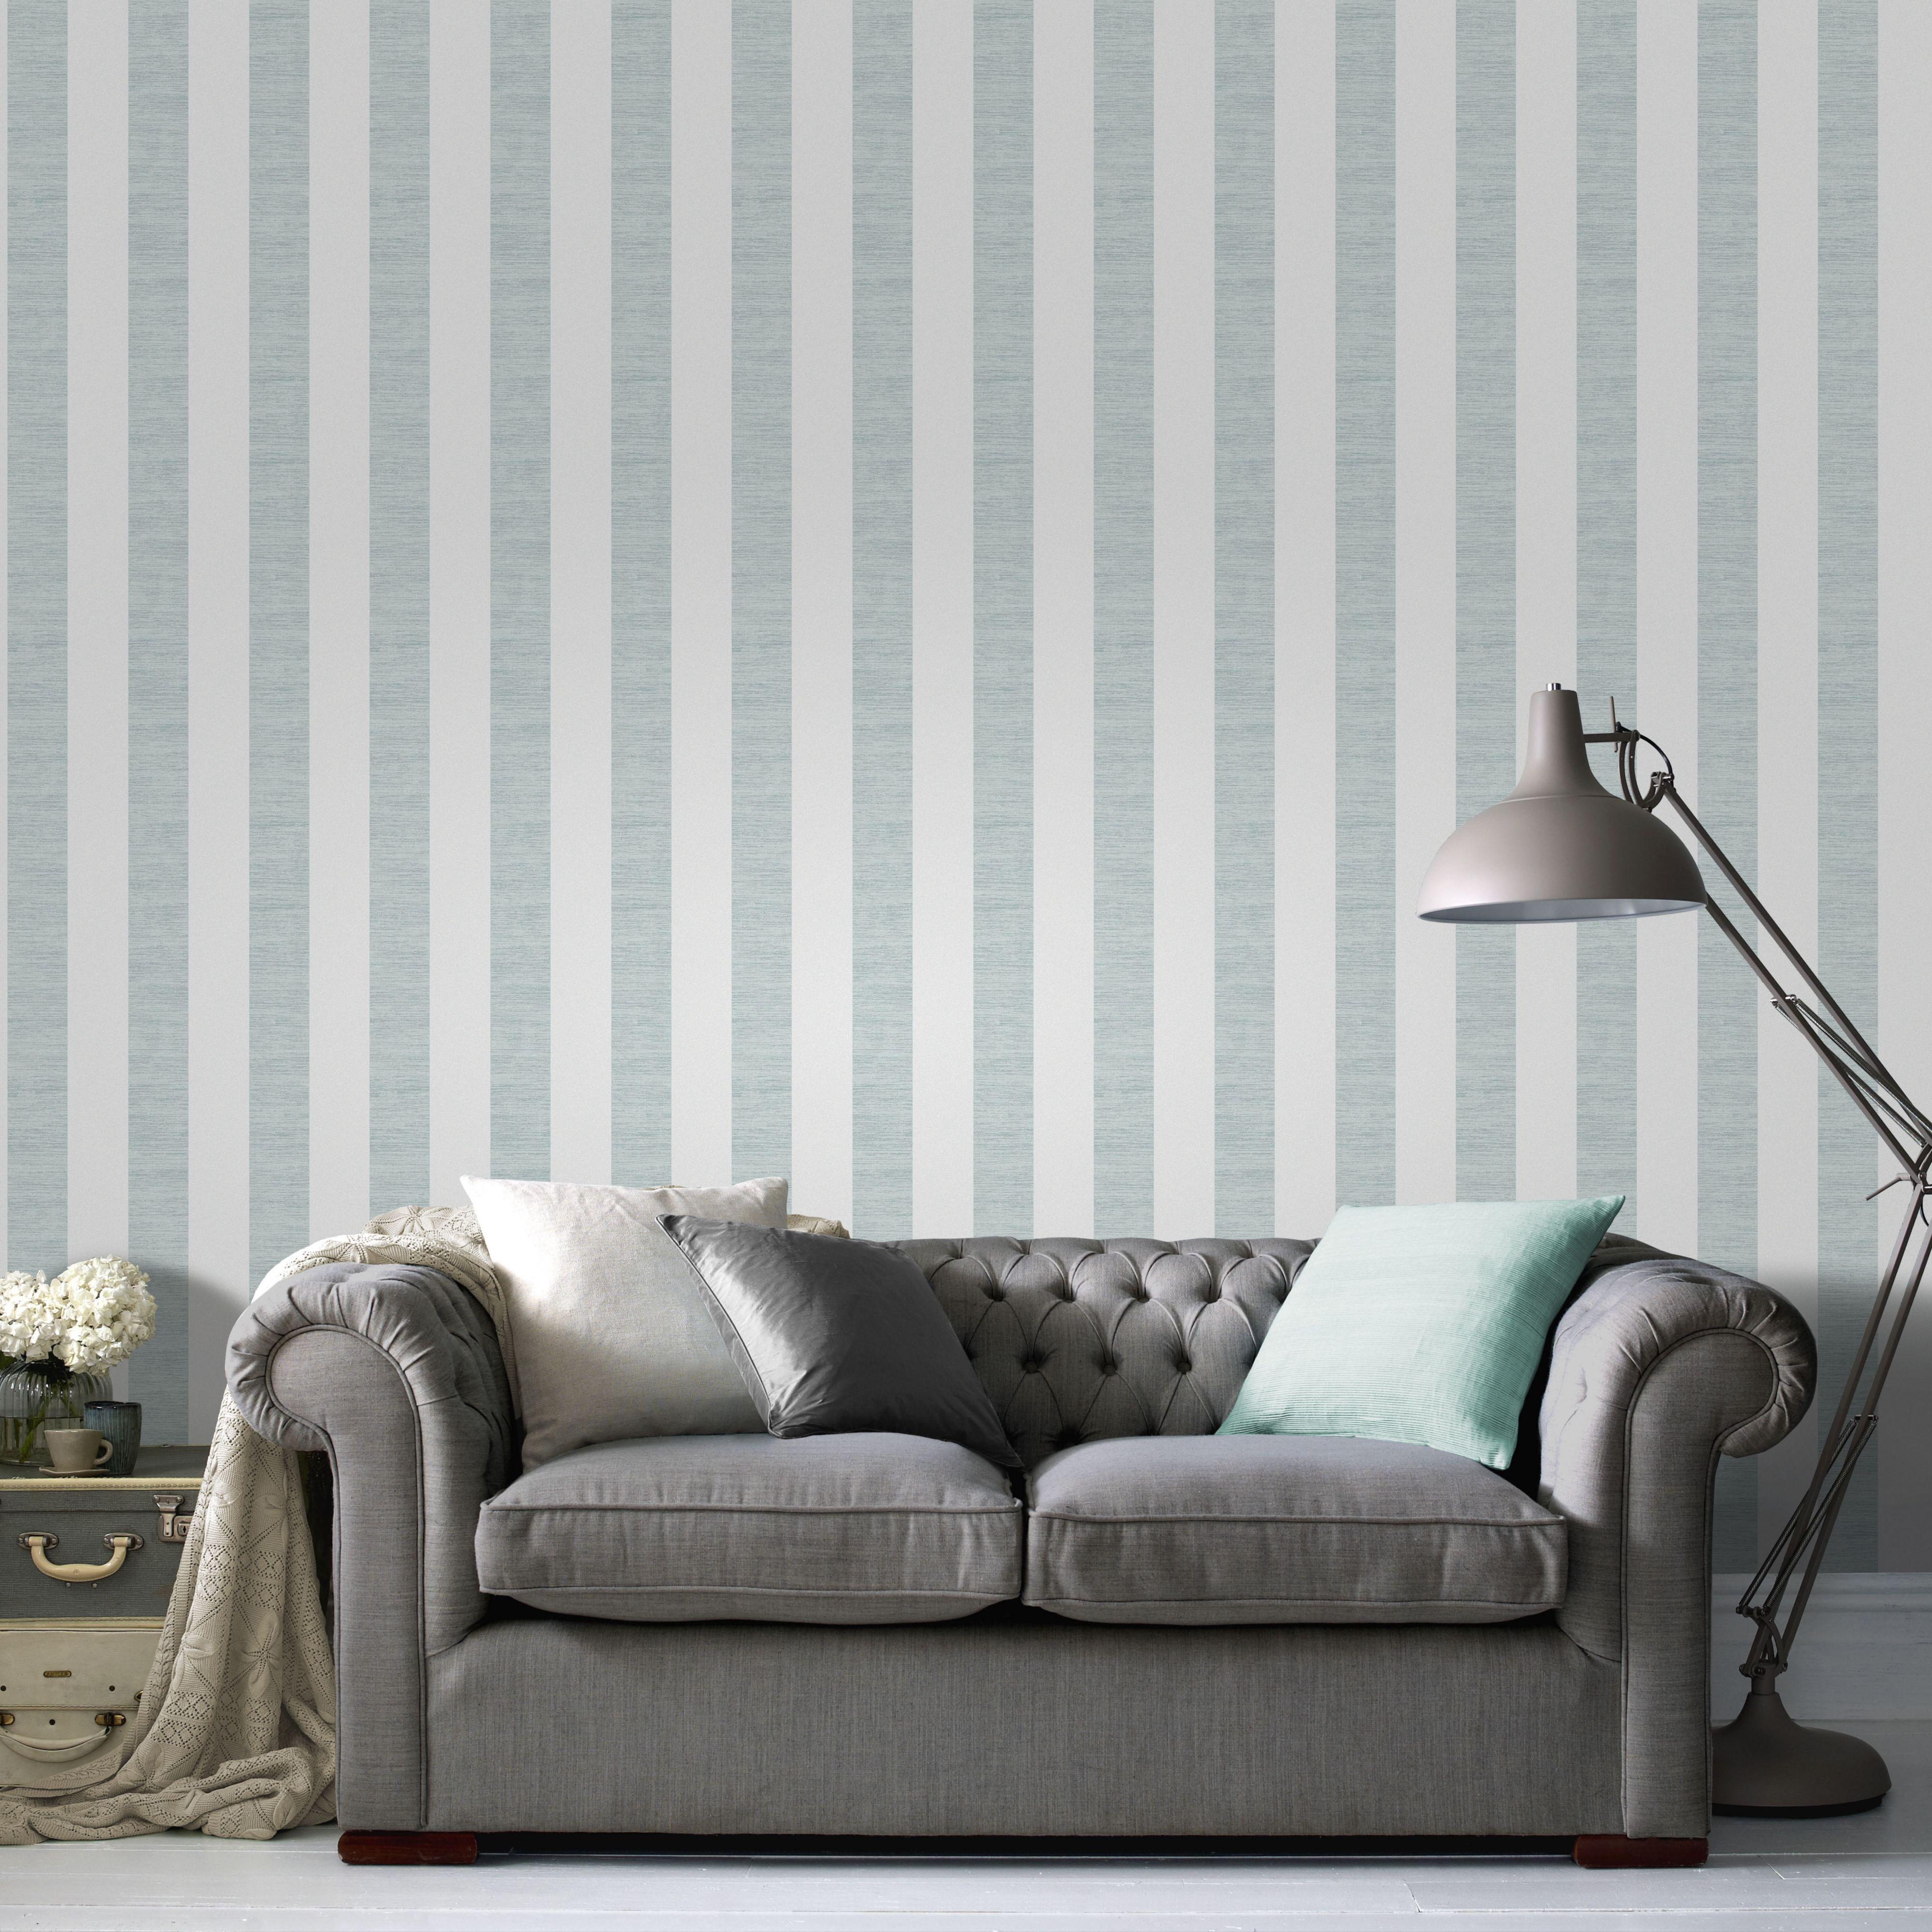 Duck Egg Shimmer Glitter Effect Wallpaper Departments Diy At B Q Silver Wallpaper Living Room White And Silver Wallpaper Striped Wallpaper